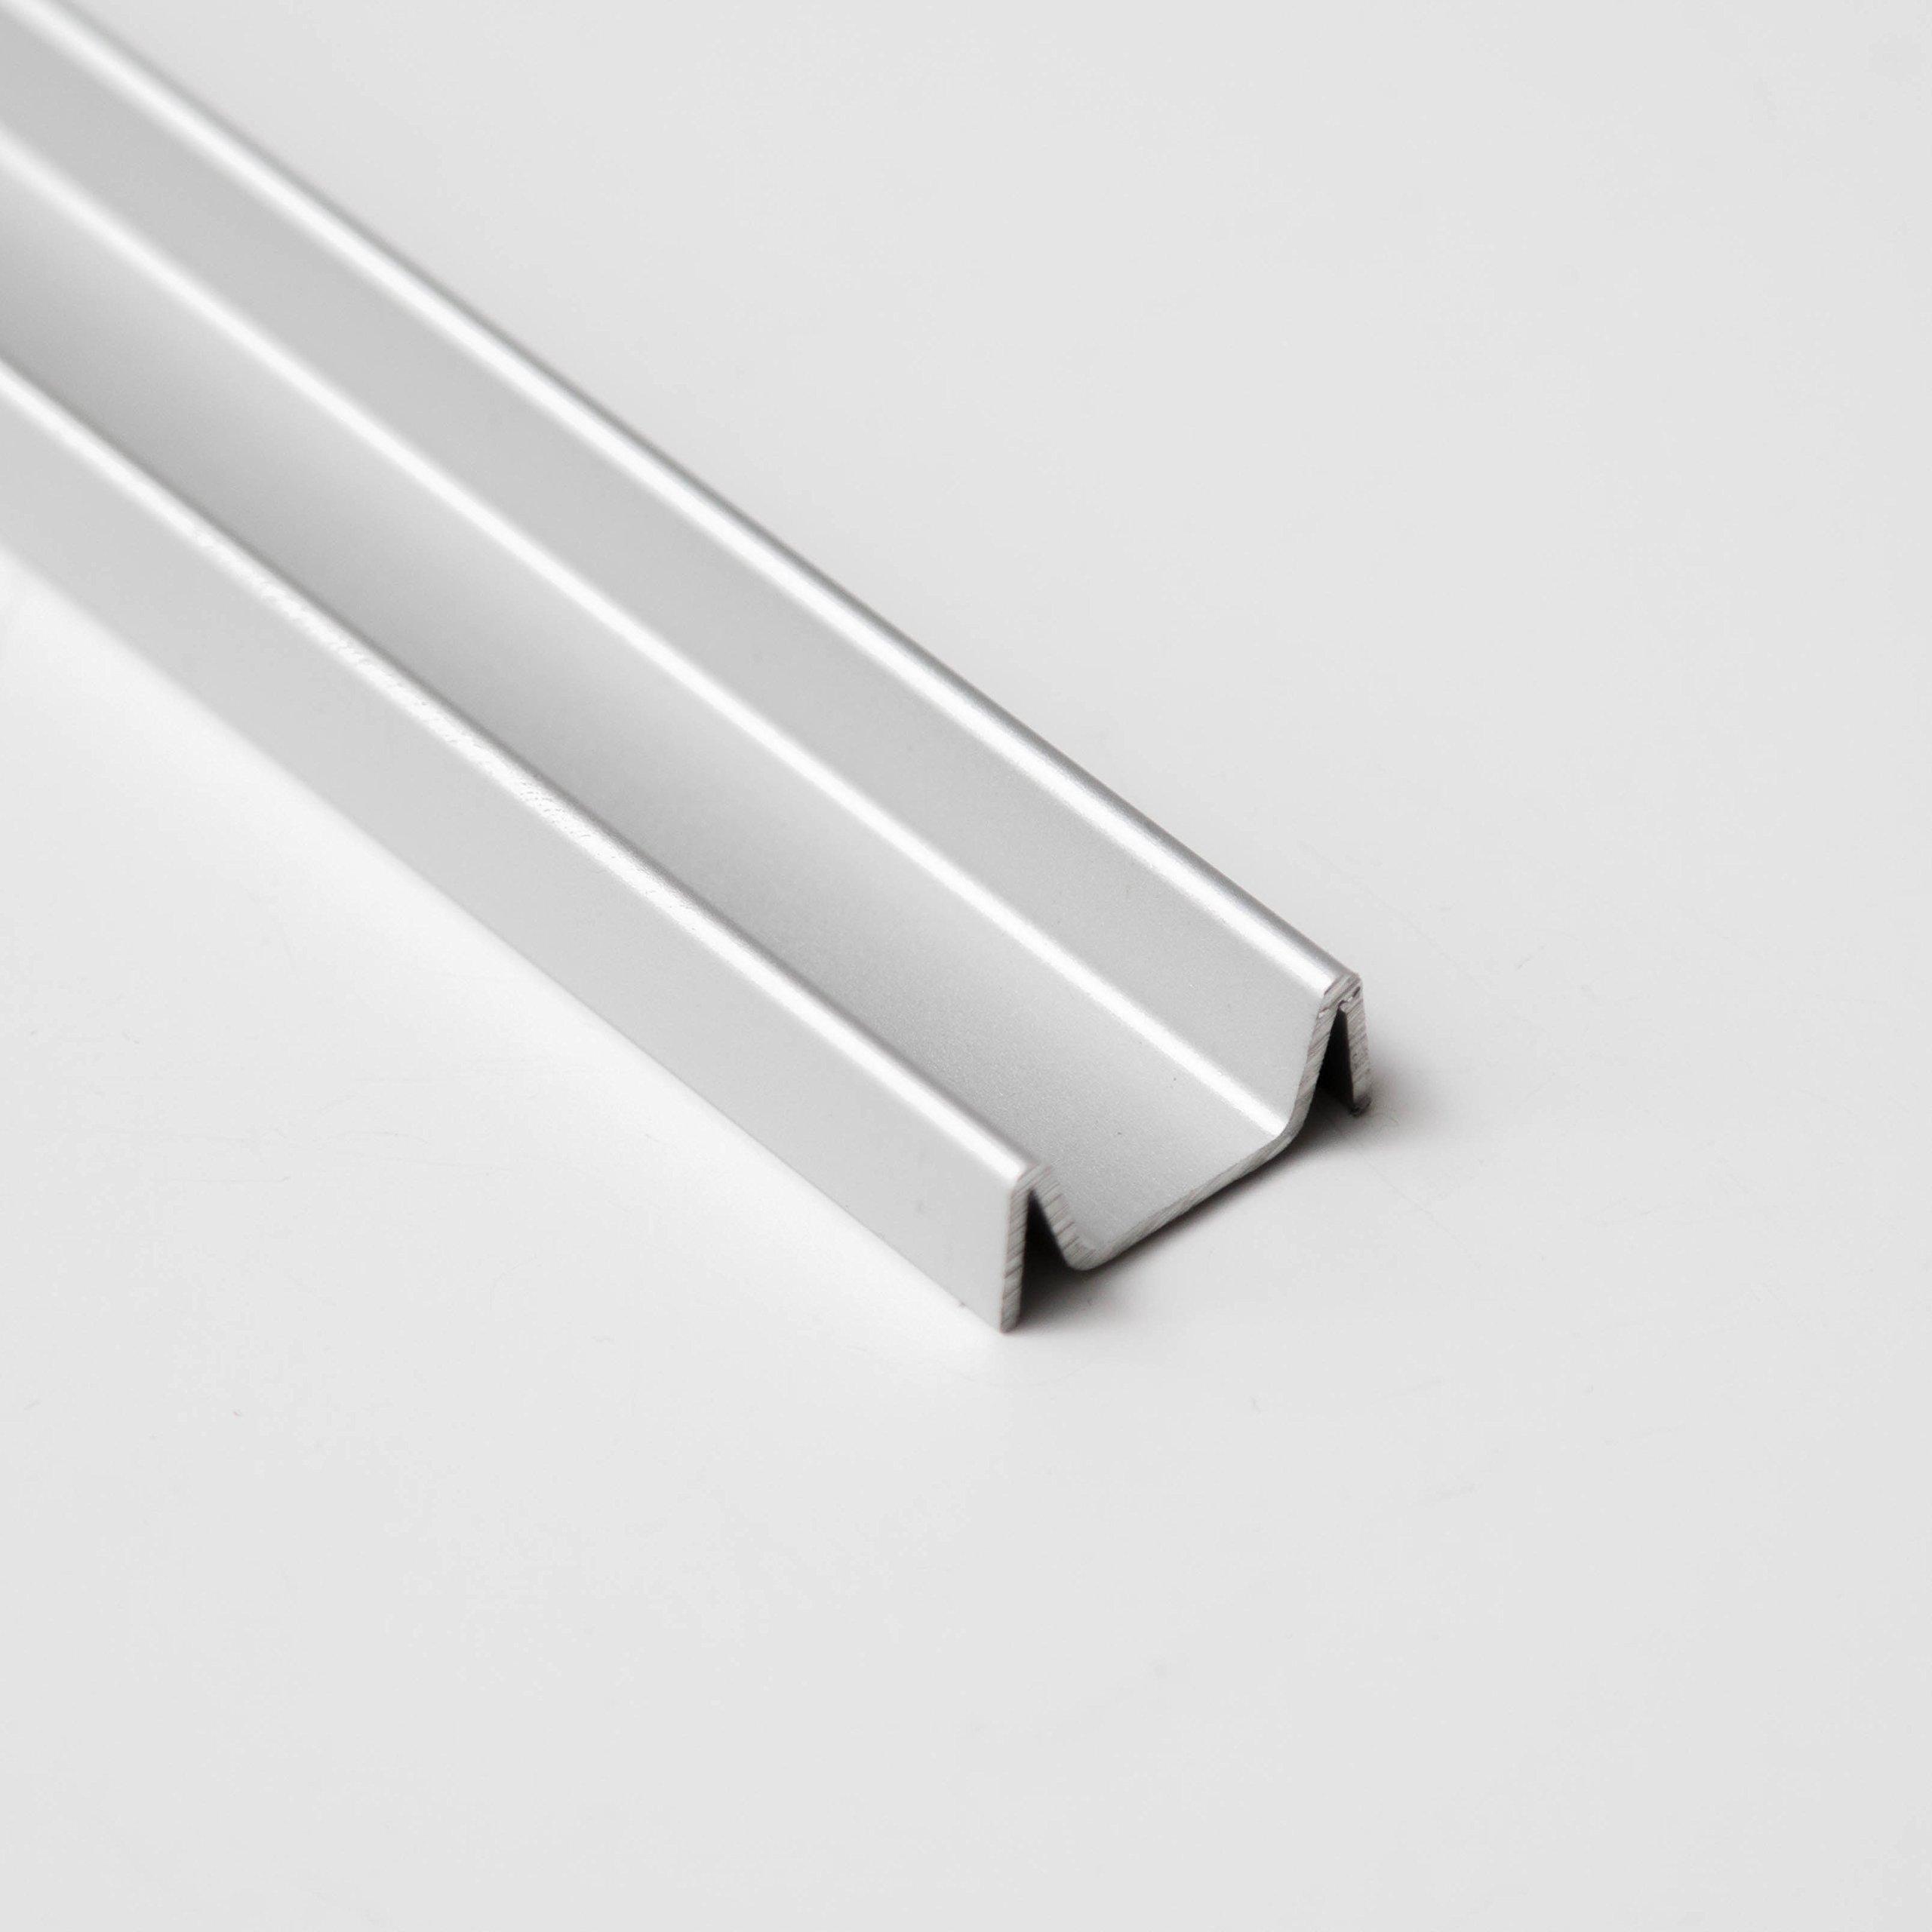 Sliding Screen Door Tracking - Silver Deluxe Double Bottom Track 72''